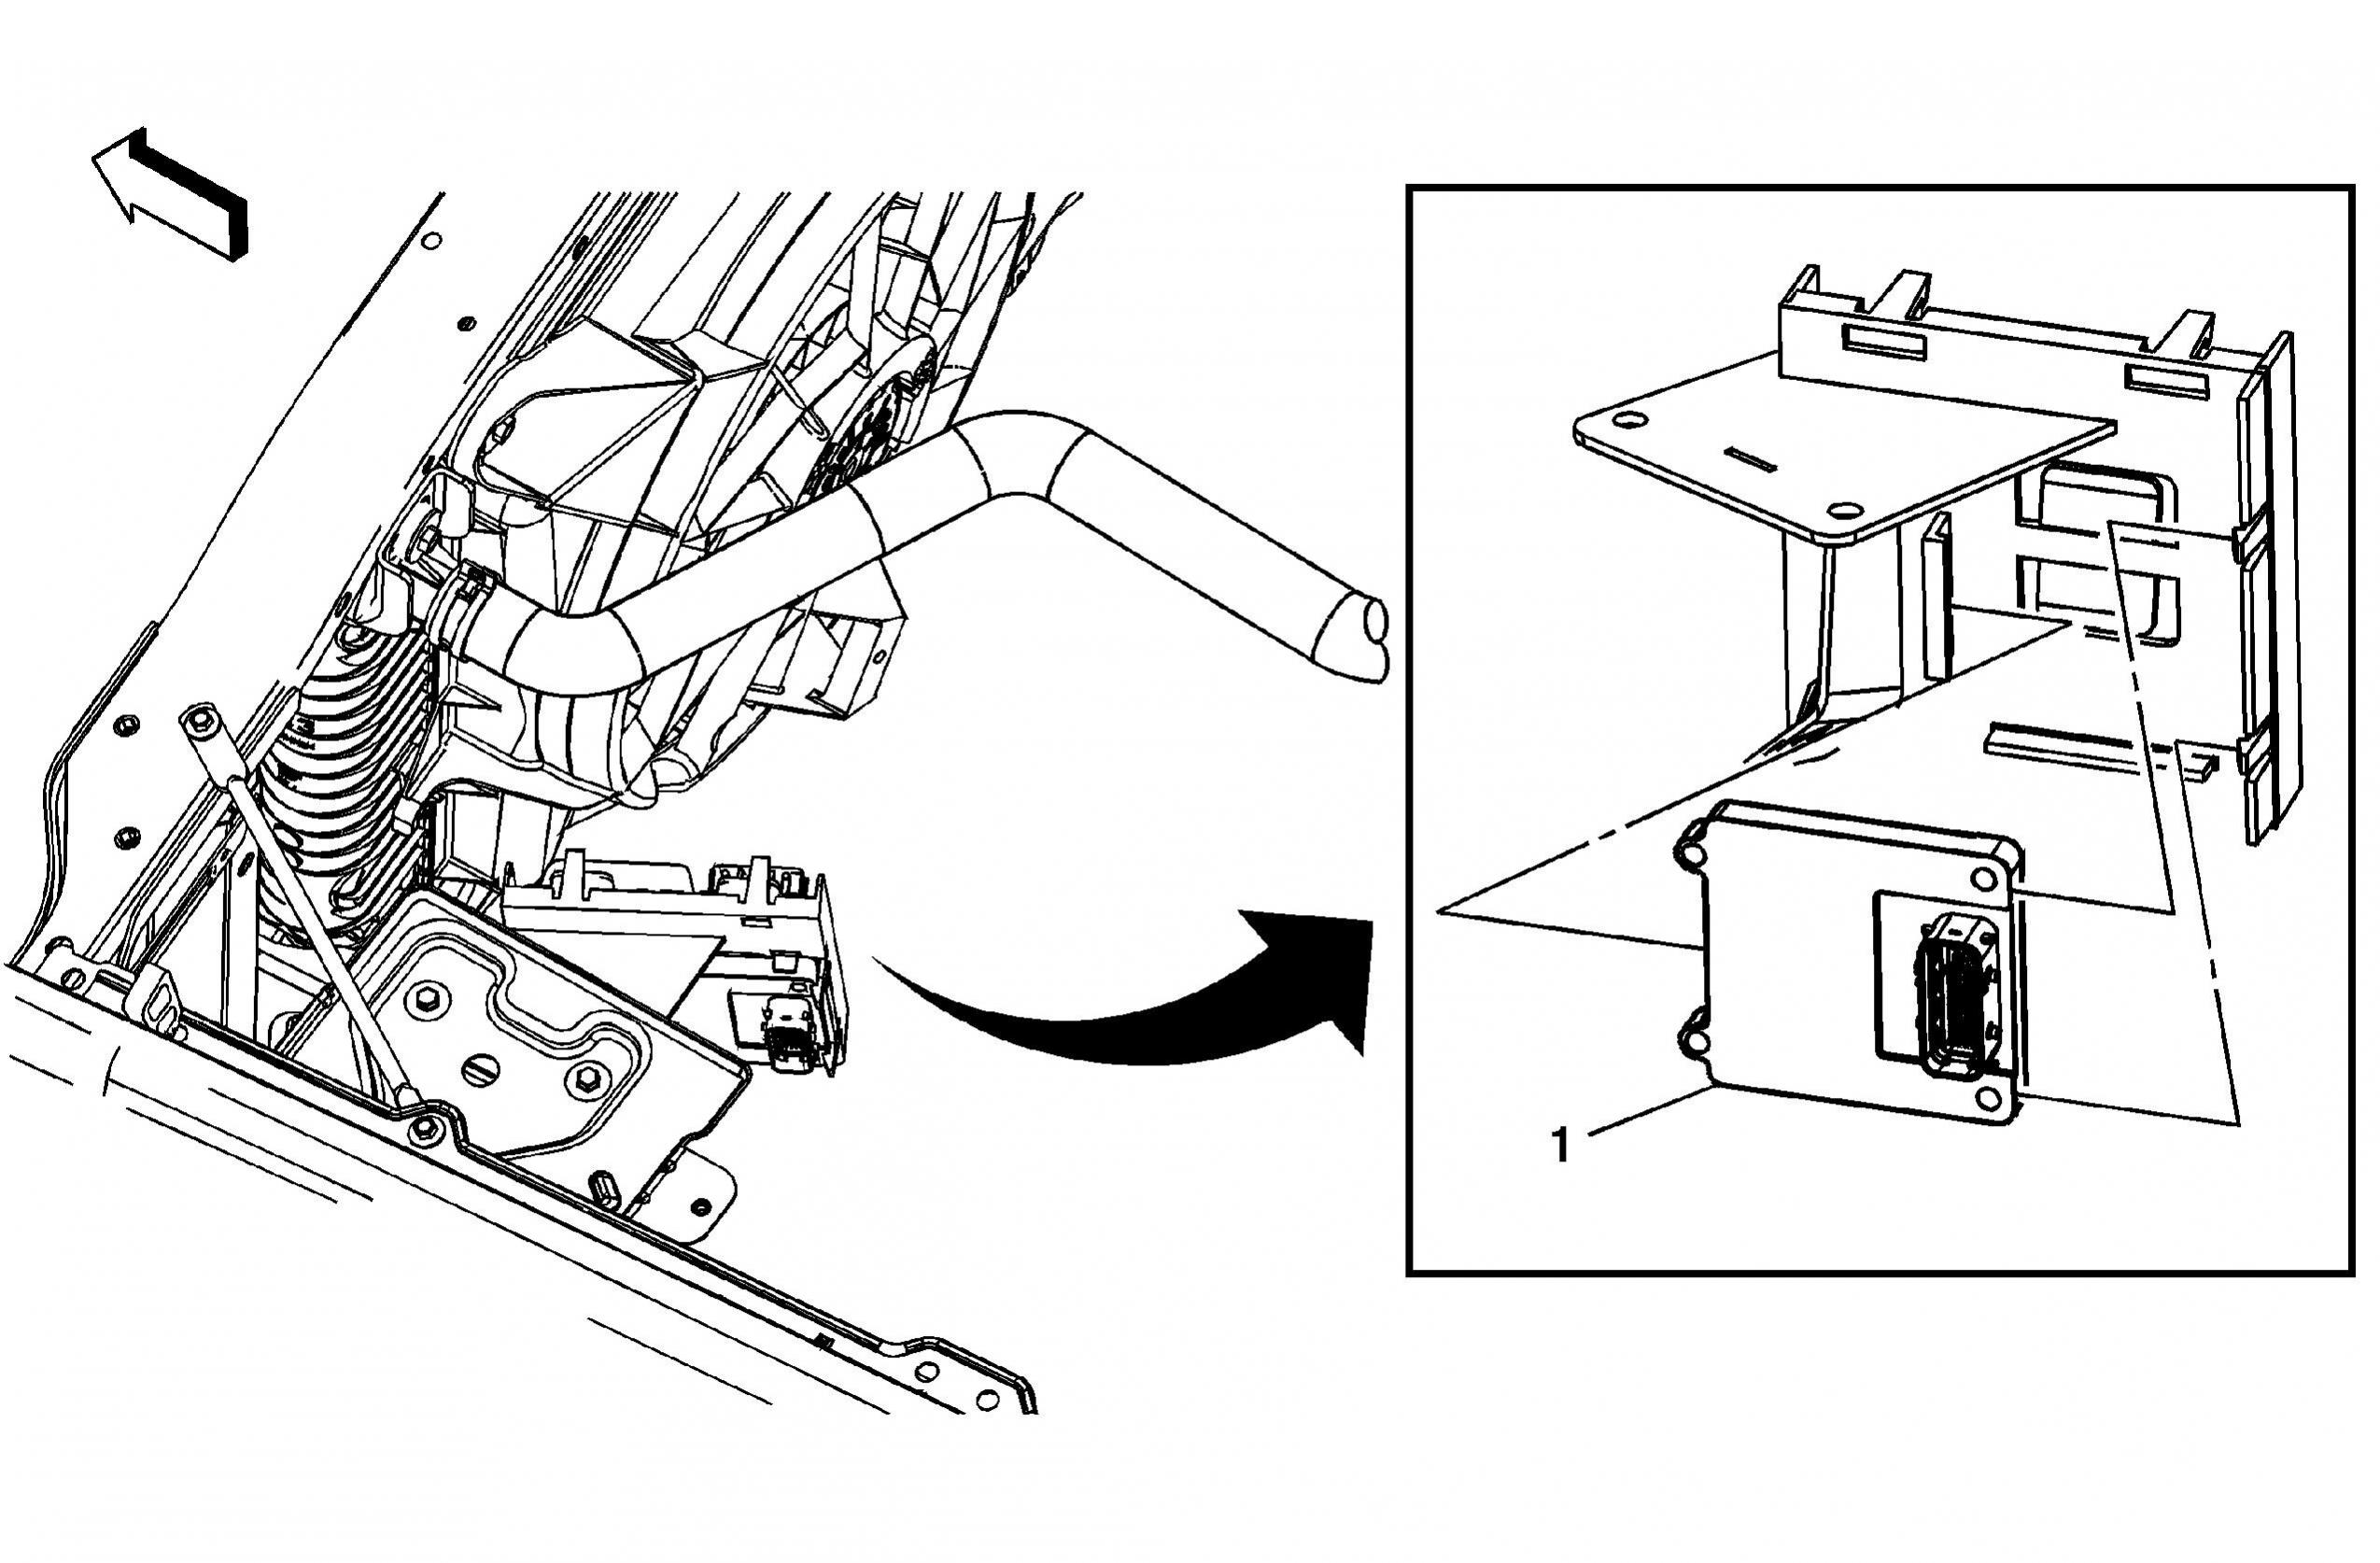 2008 chevy uplander starter wiring diagram